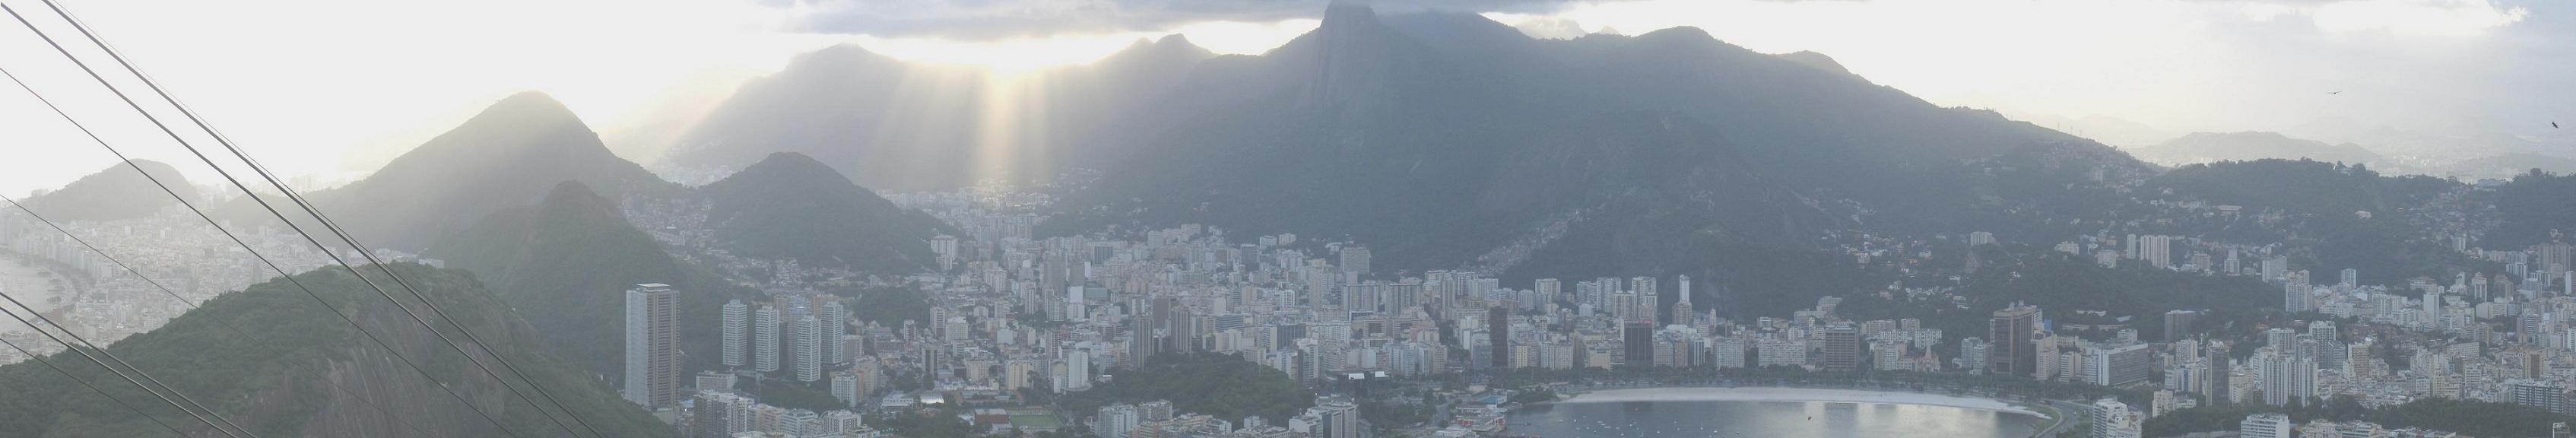 Brazil_rio2